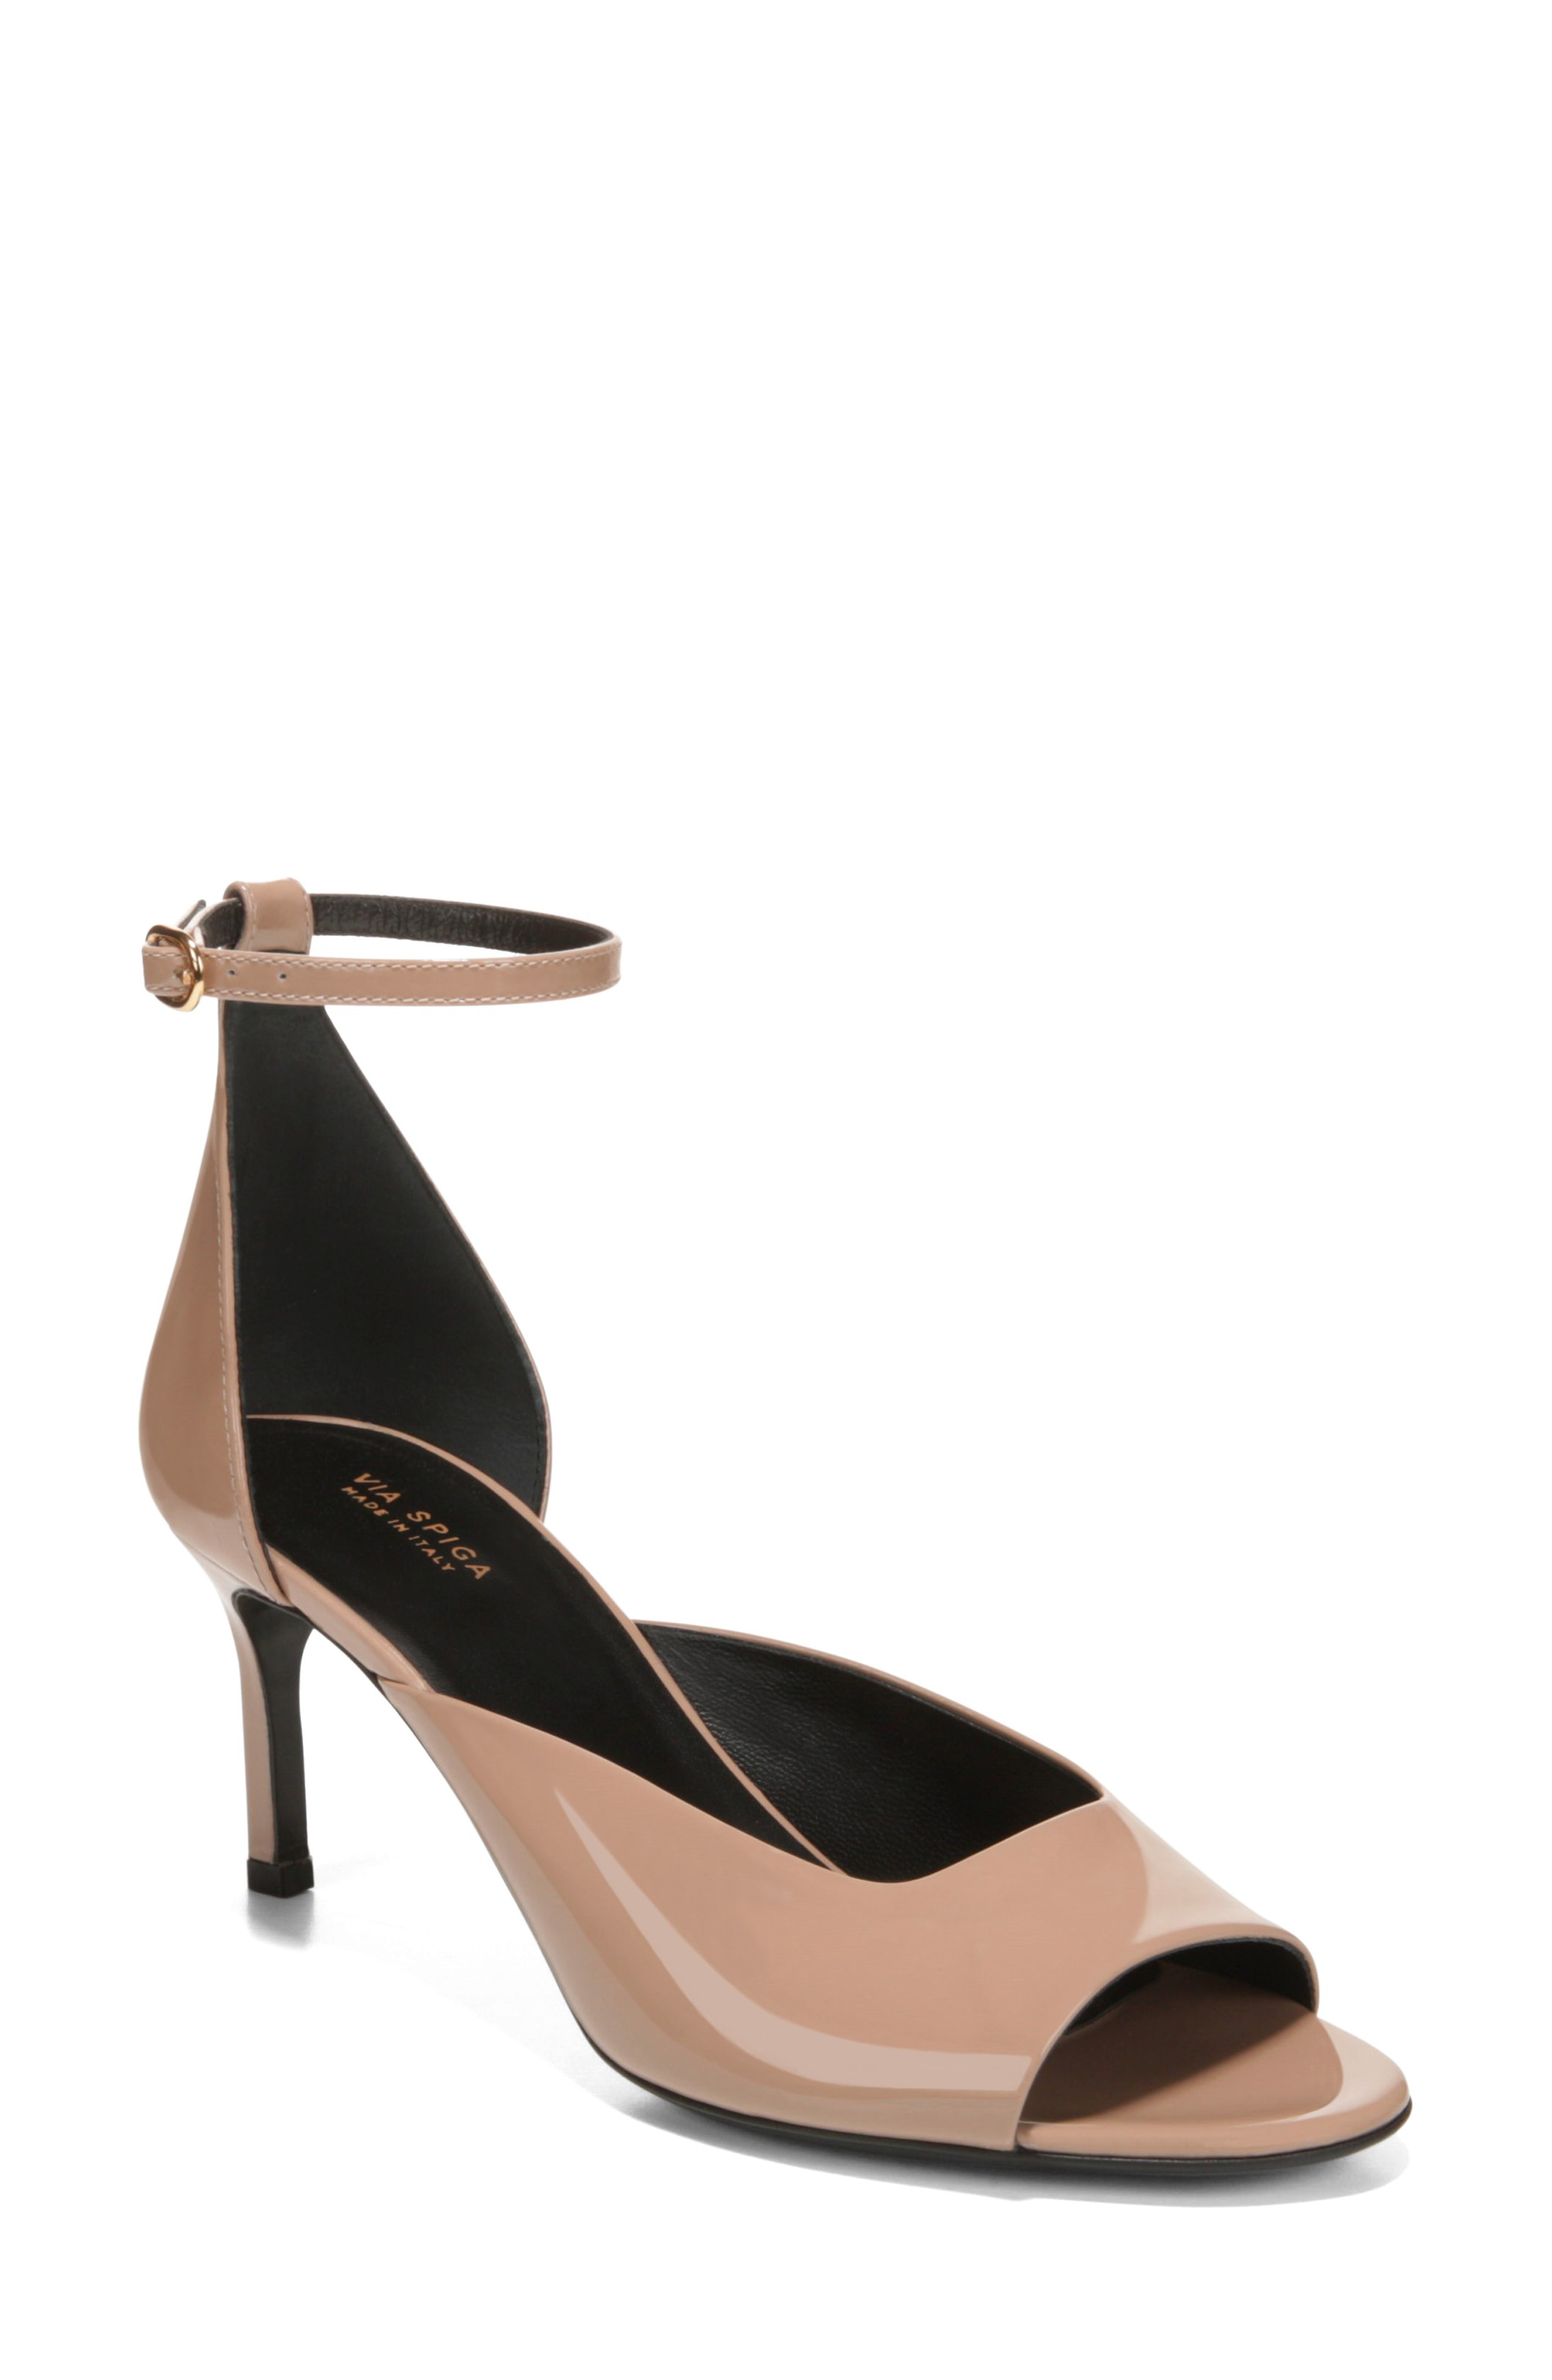 807c3d3b172 Via Spiga Women S Jennie Patent Leather Mid-Heel Sandals In Nude Patent